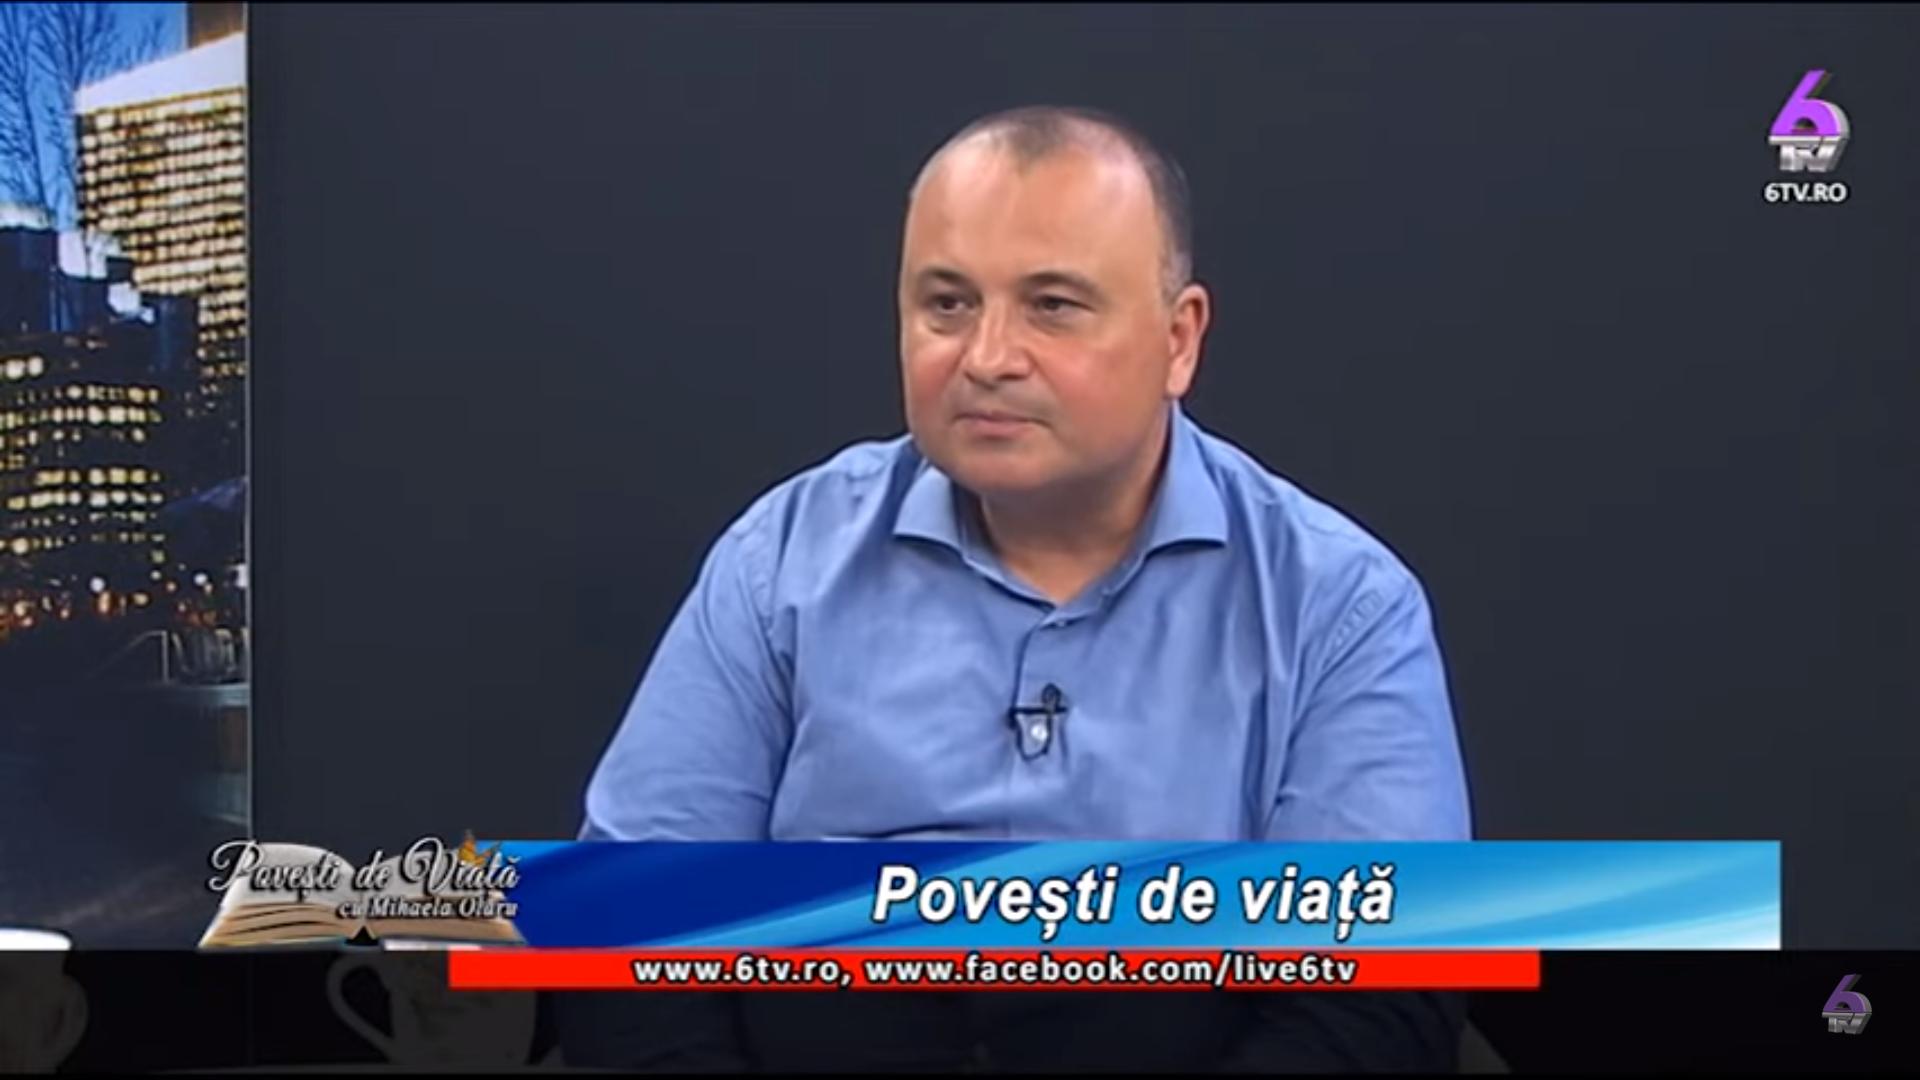 32. Prof. Univ. Dr. Radu Carp